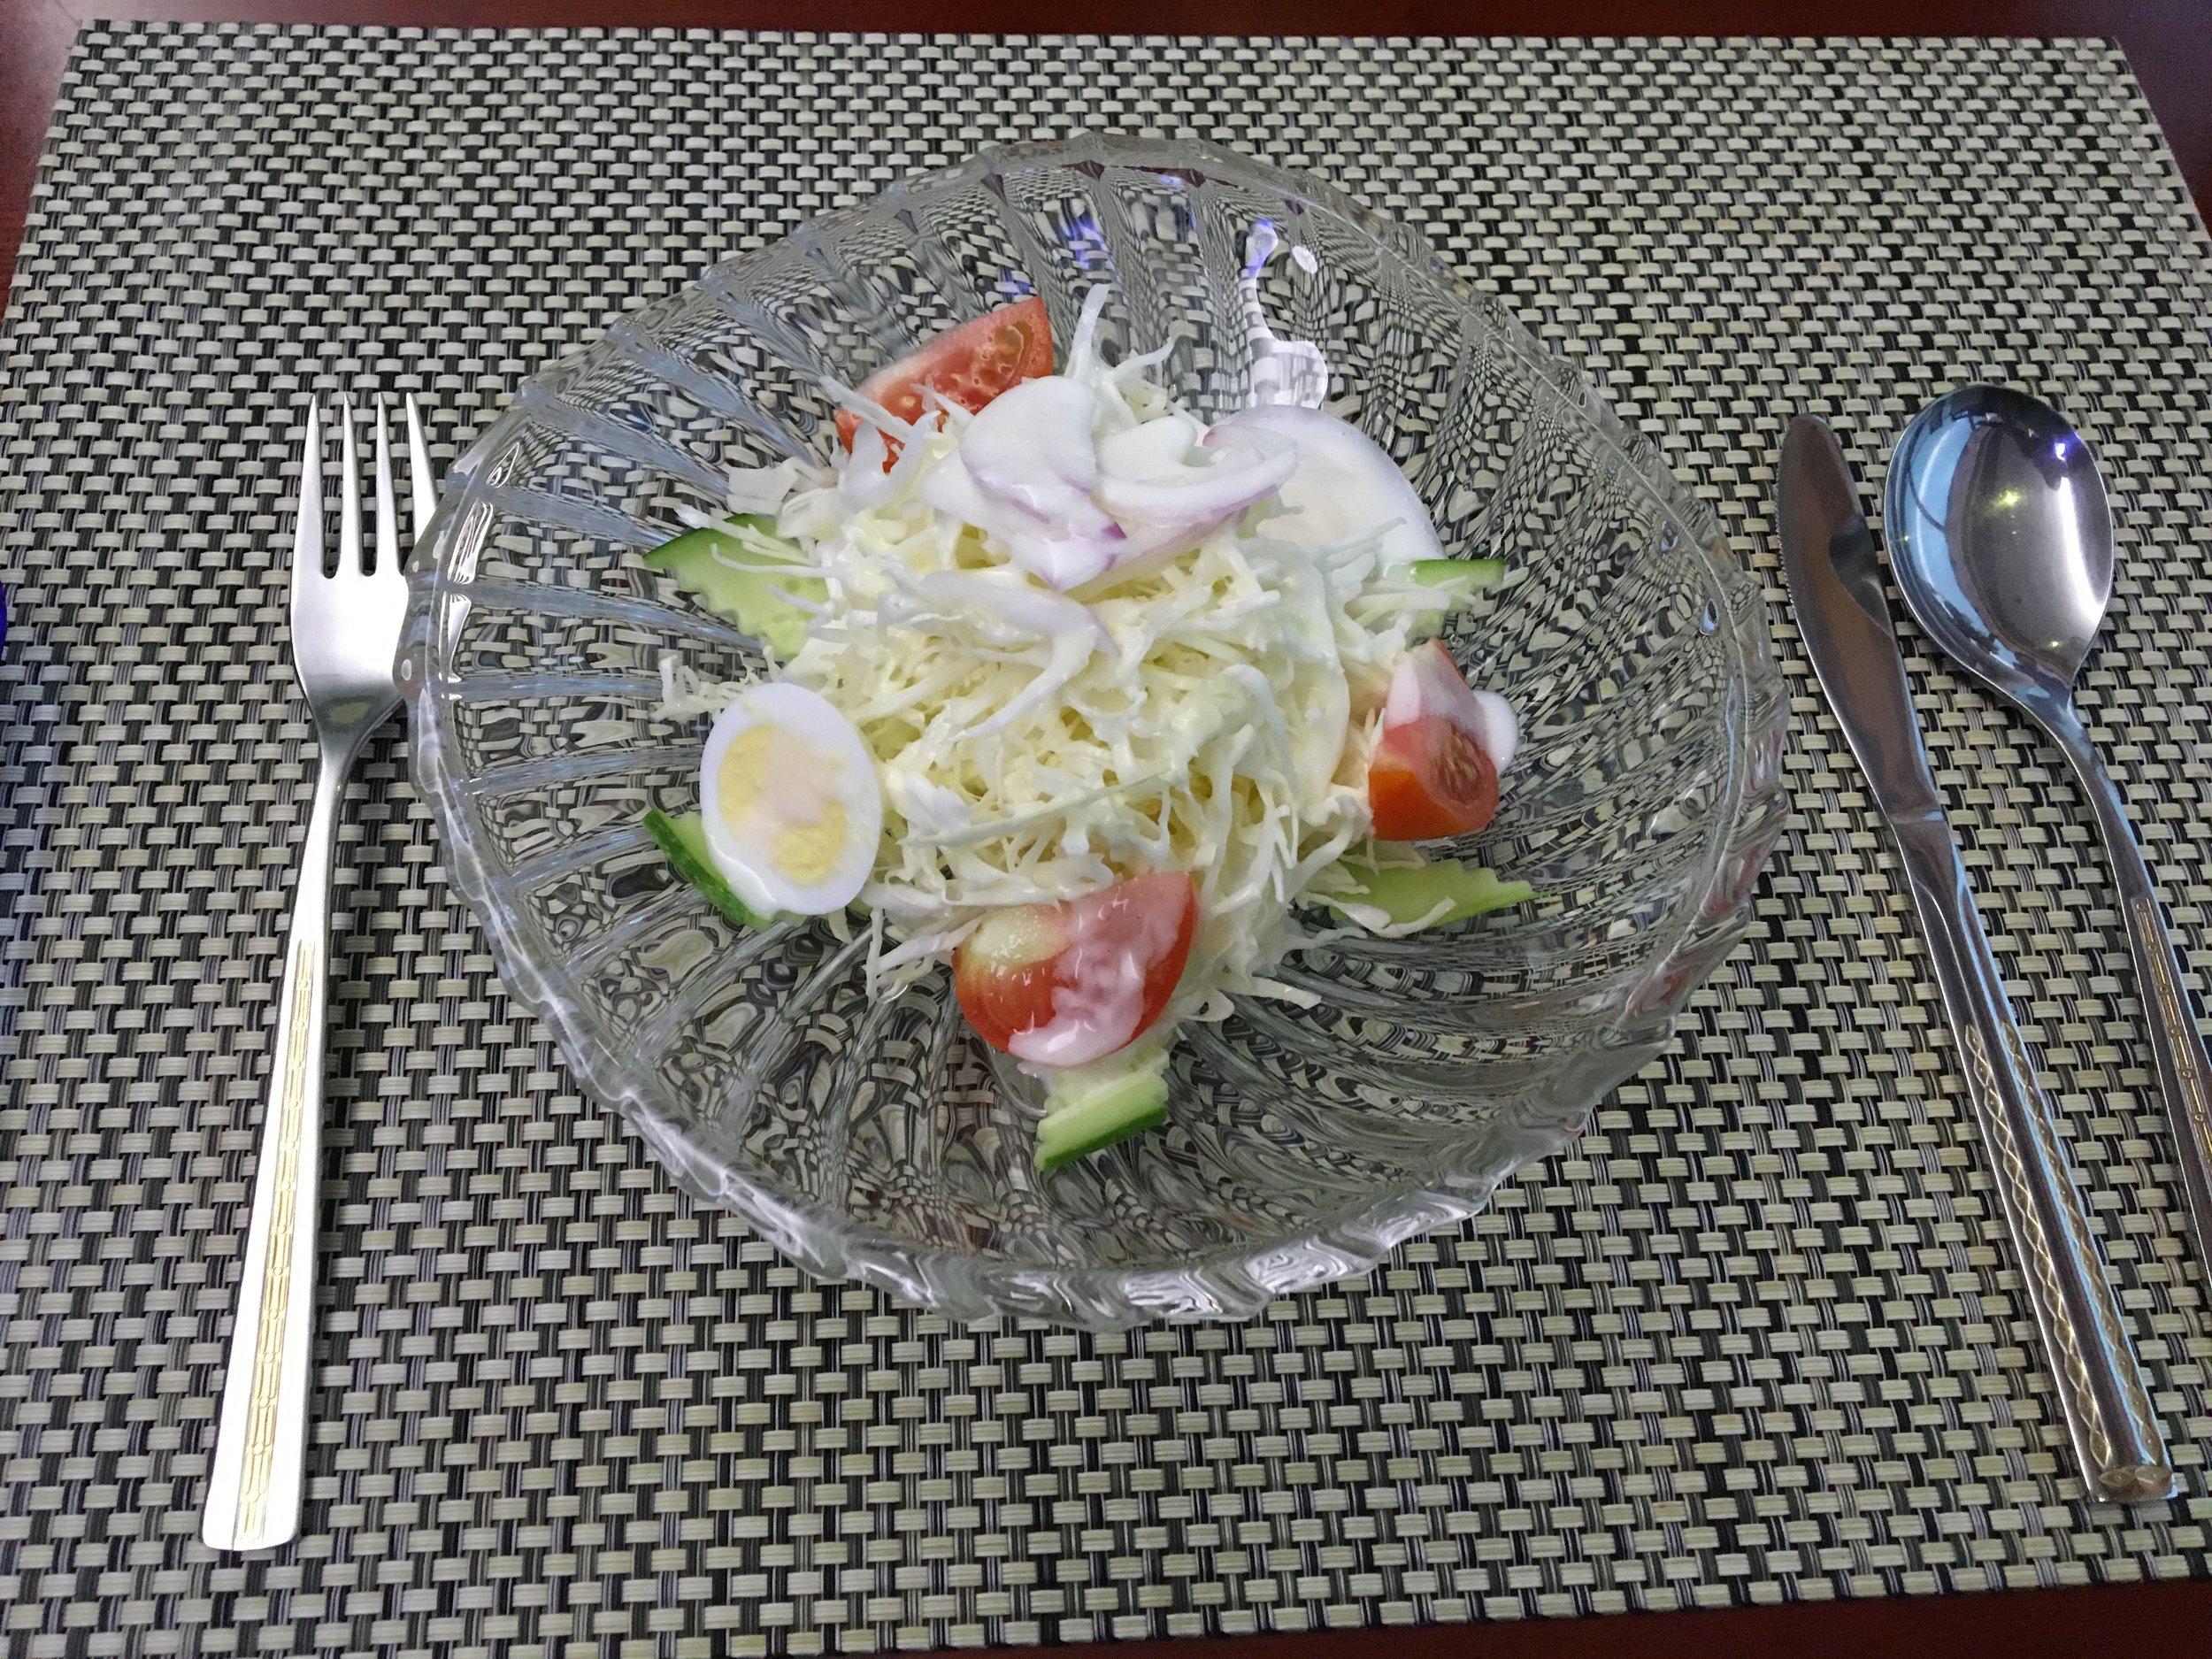 Salad with vinegar and mayo sauce